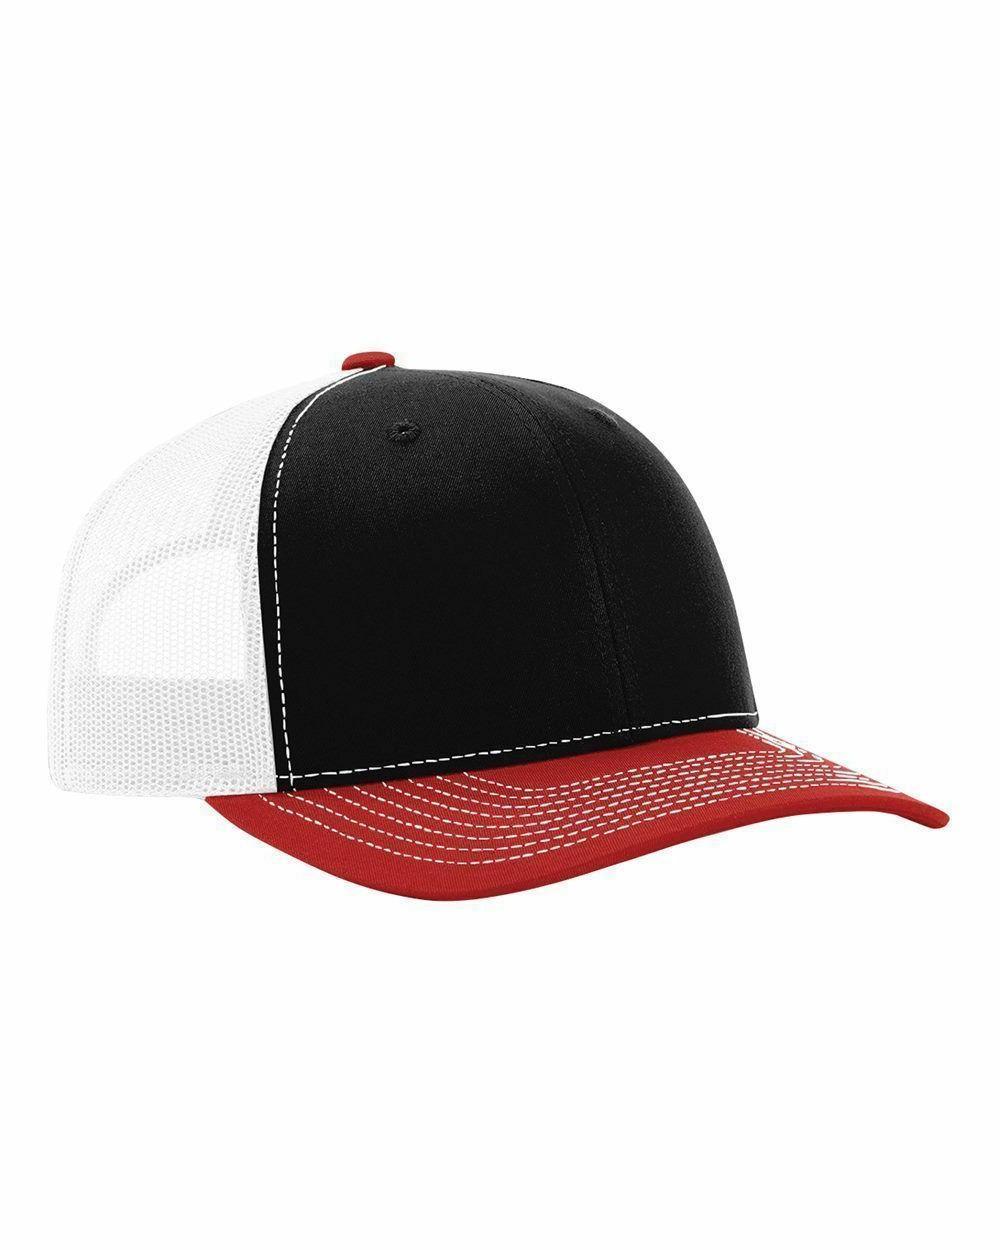 $1.99 Brand Trucker Hat Snapback Cap